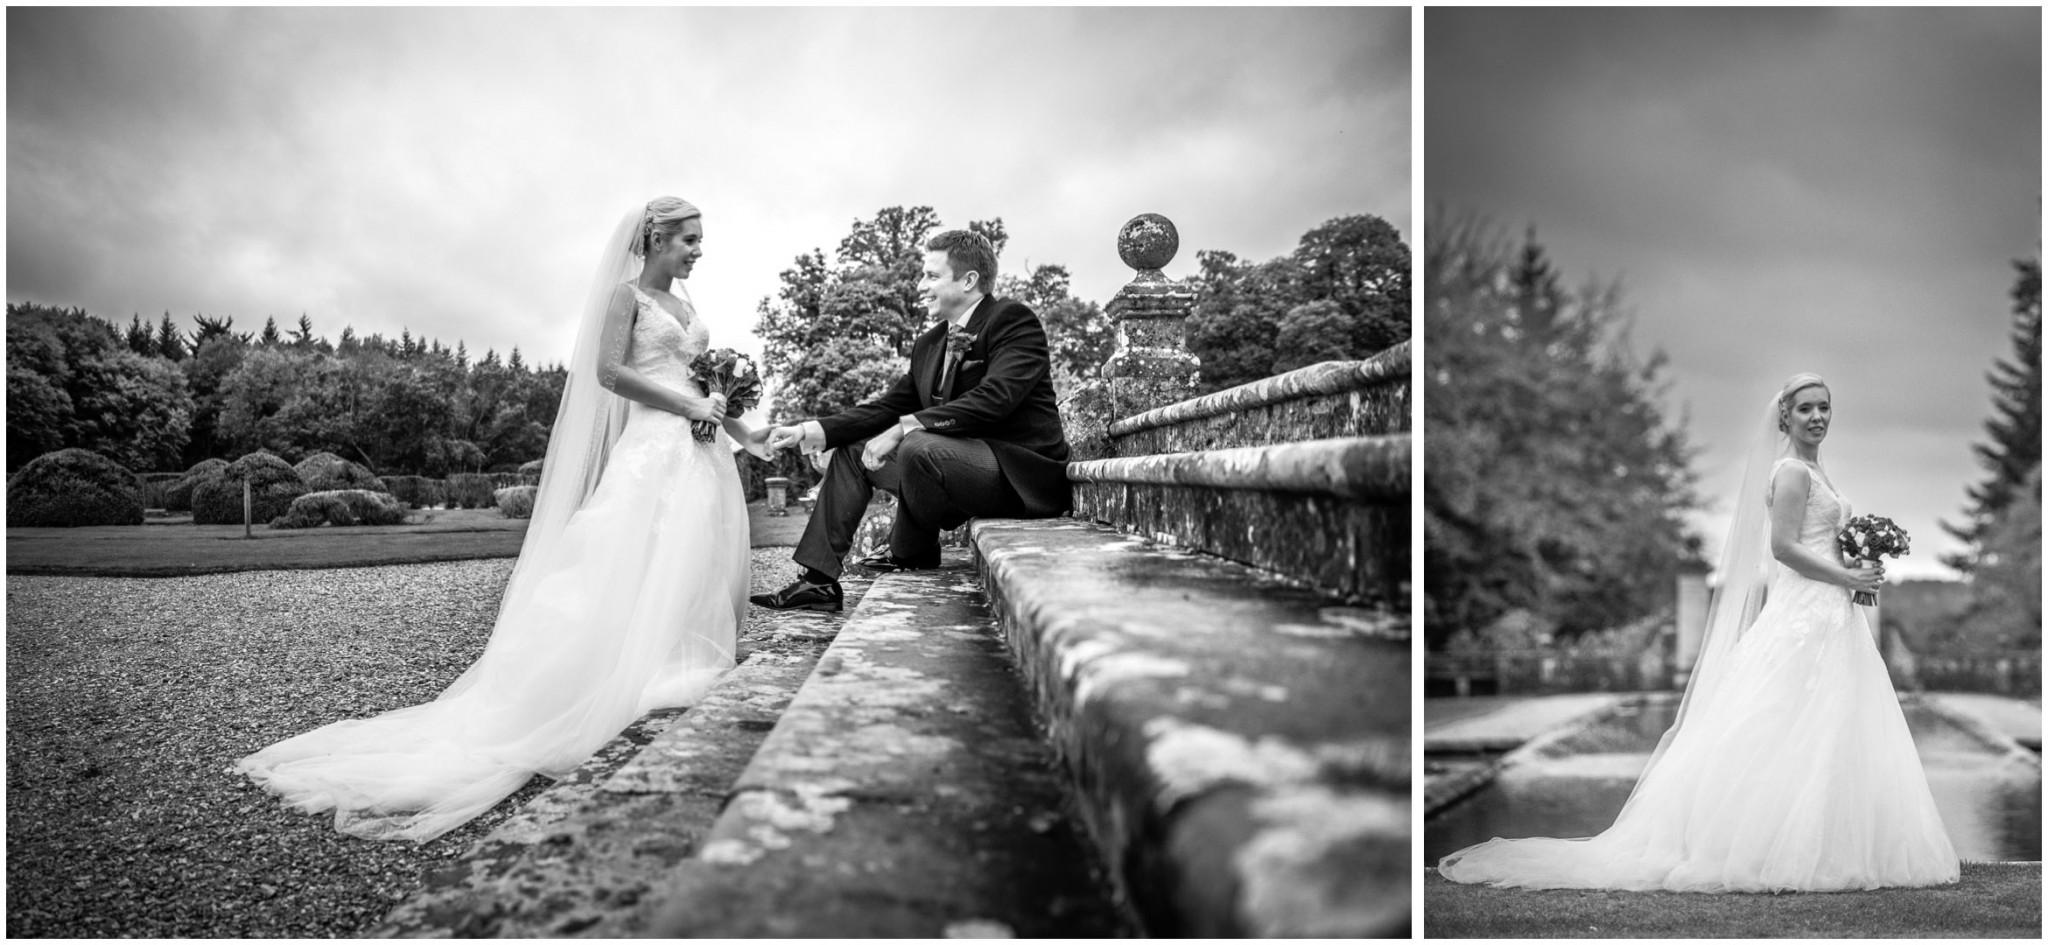 Rhinefield House Wedding Bride & Groom on steps